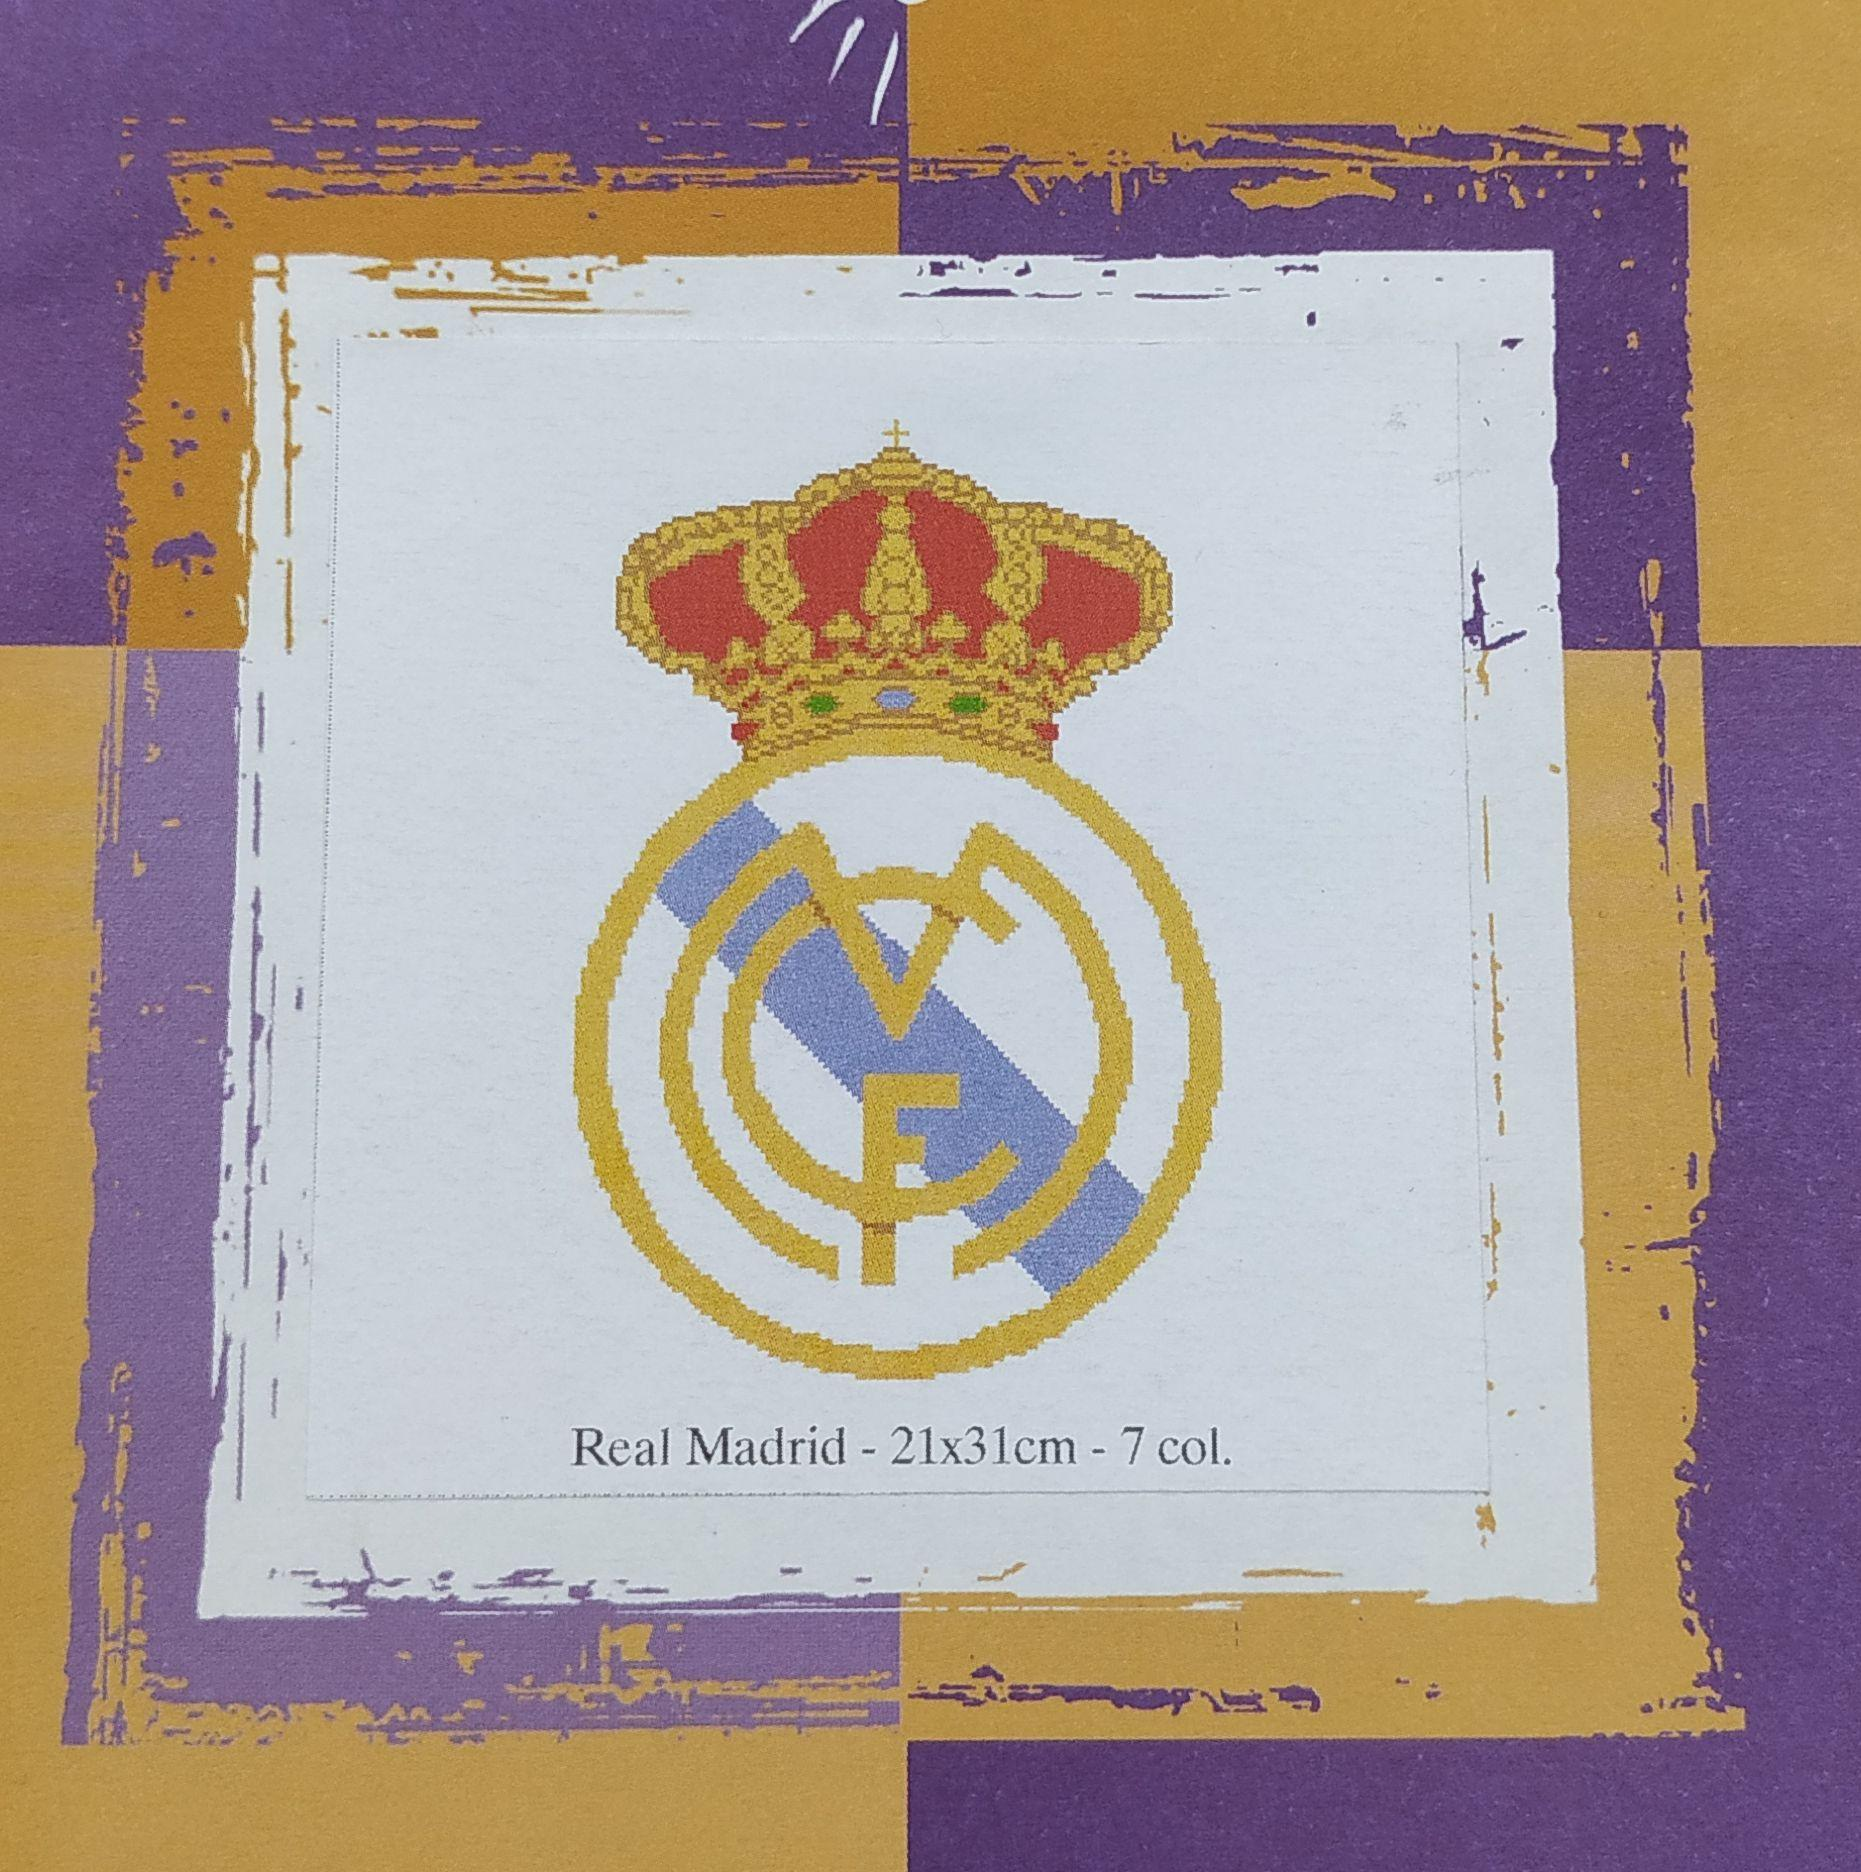 Gráfico Escudo Real Madrid